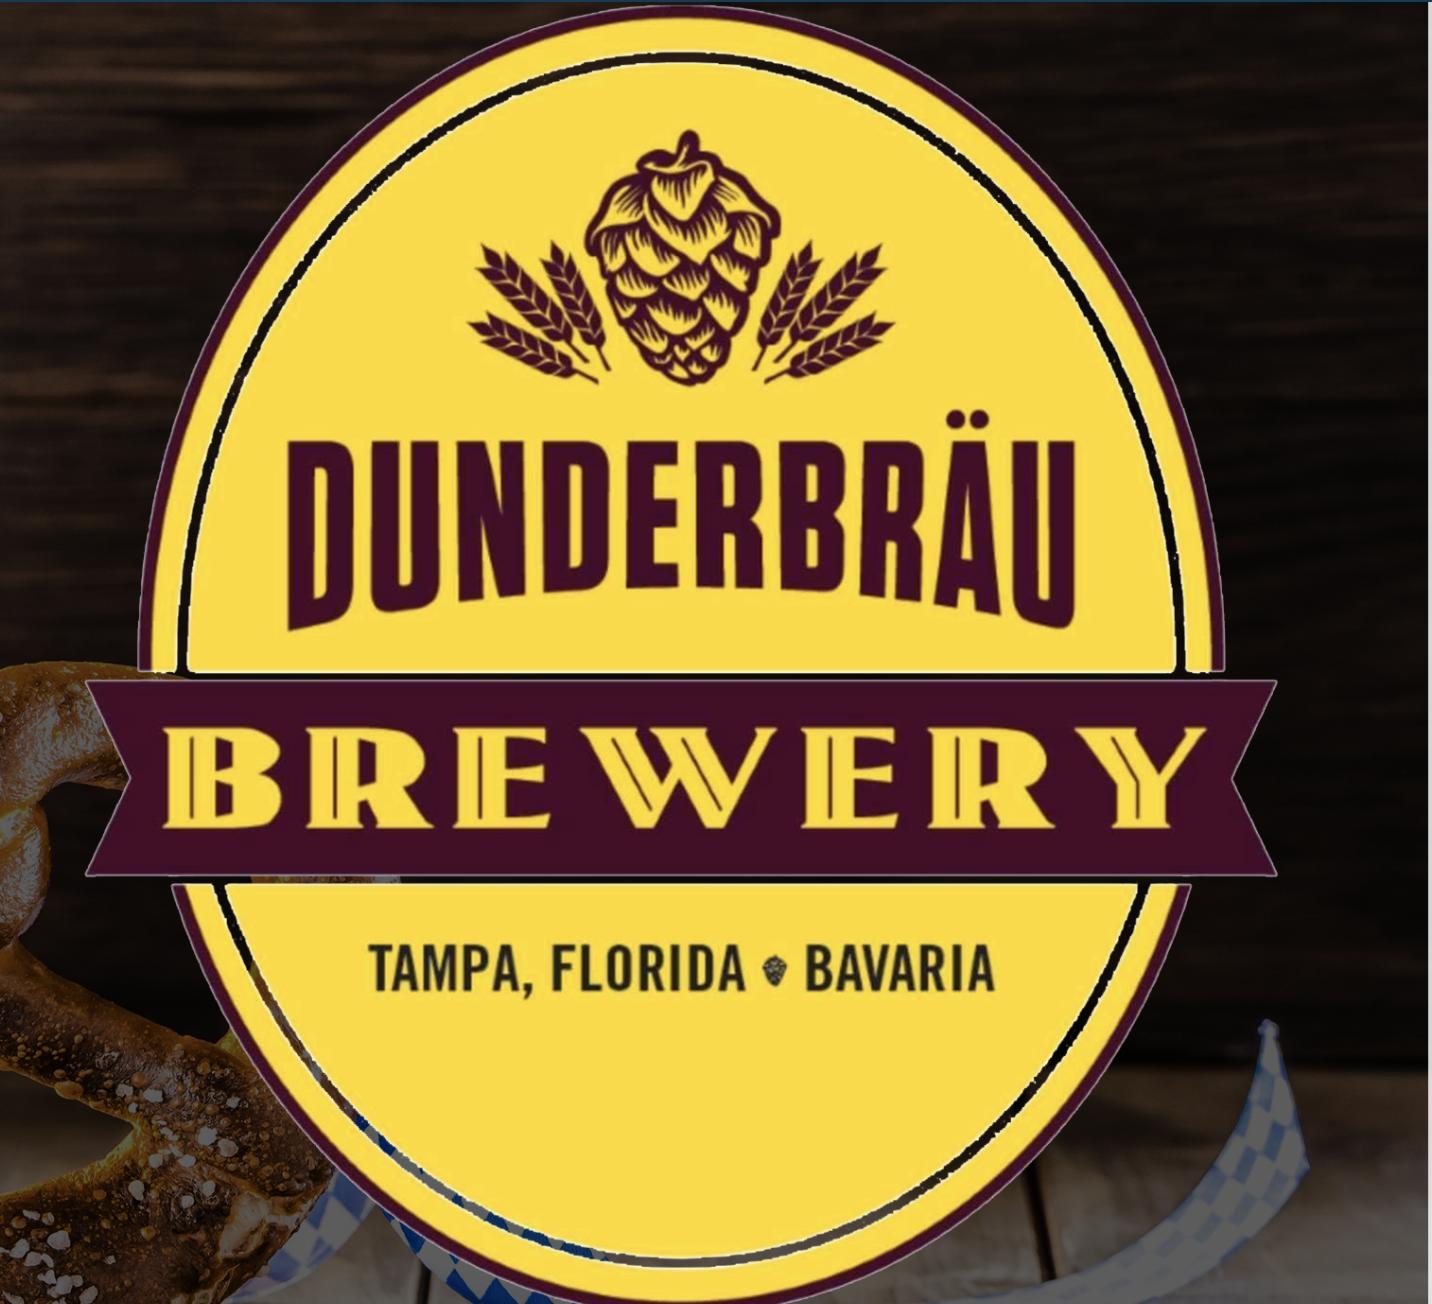 Dunderbrau Logo